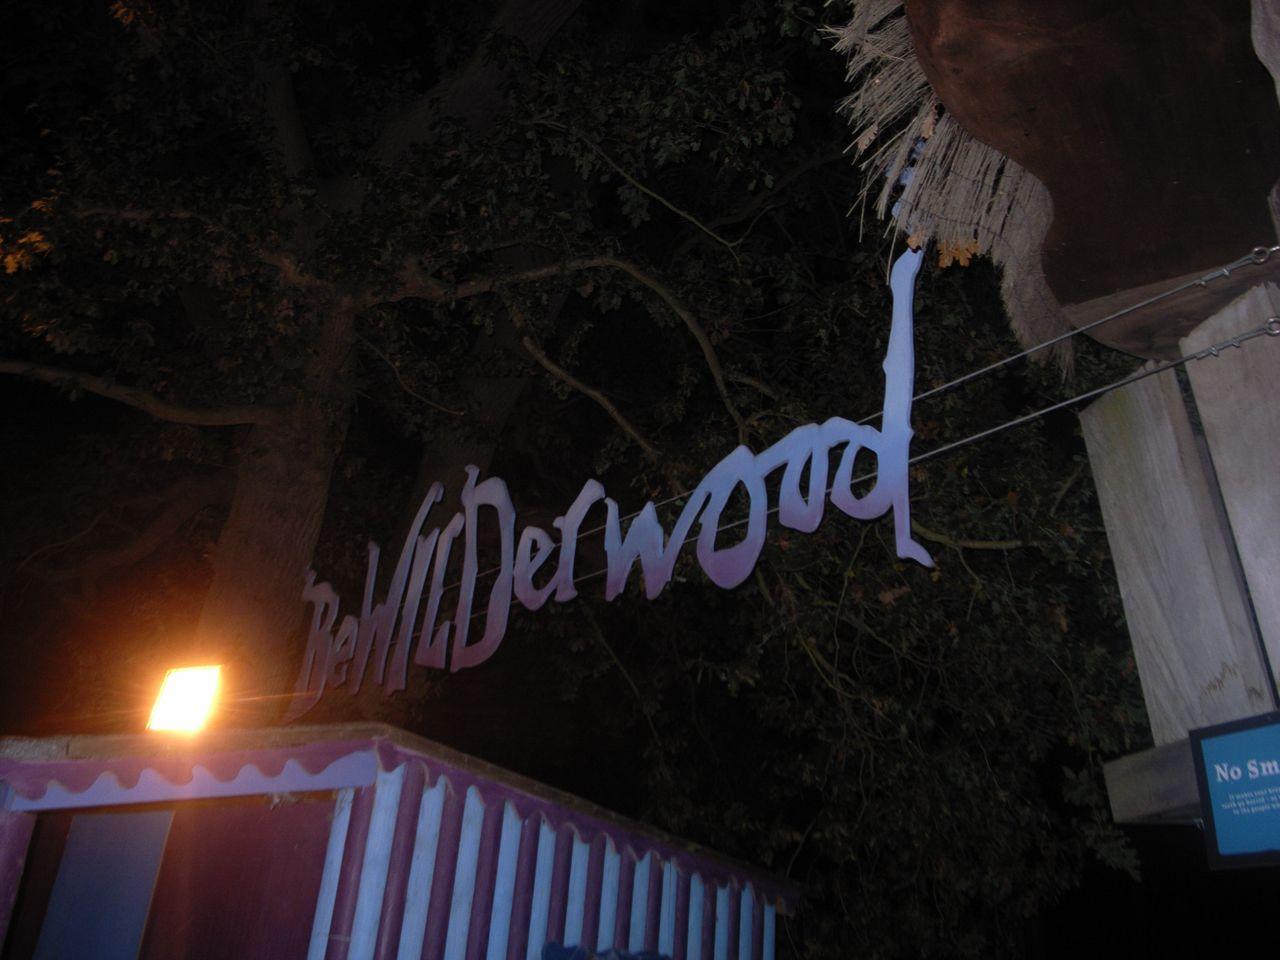 BeWILDerwood at night